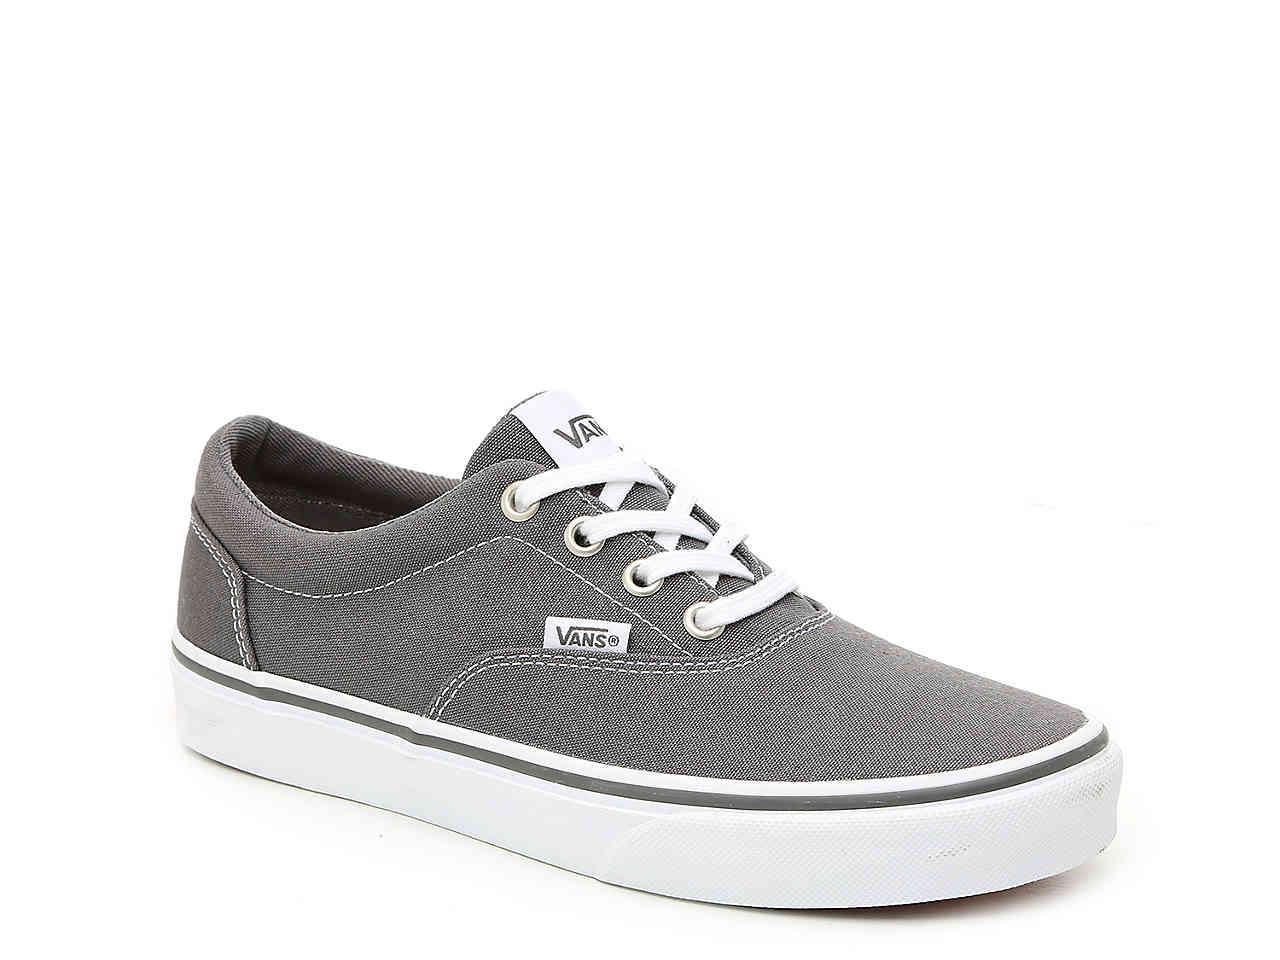 6f2942511b8 Vans - Gray Doheny Sneaker - Lyst. View fullscreen